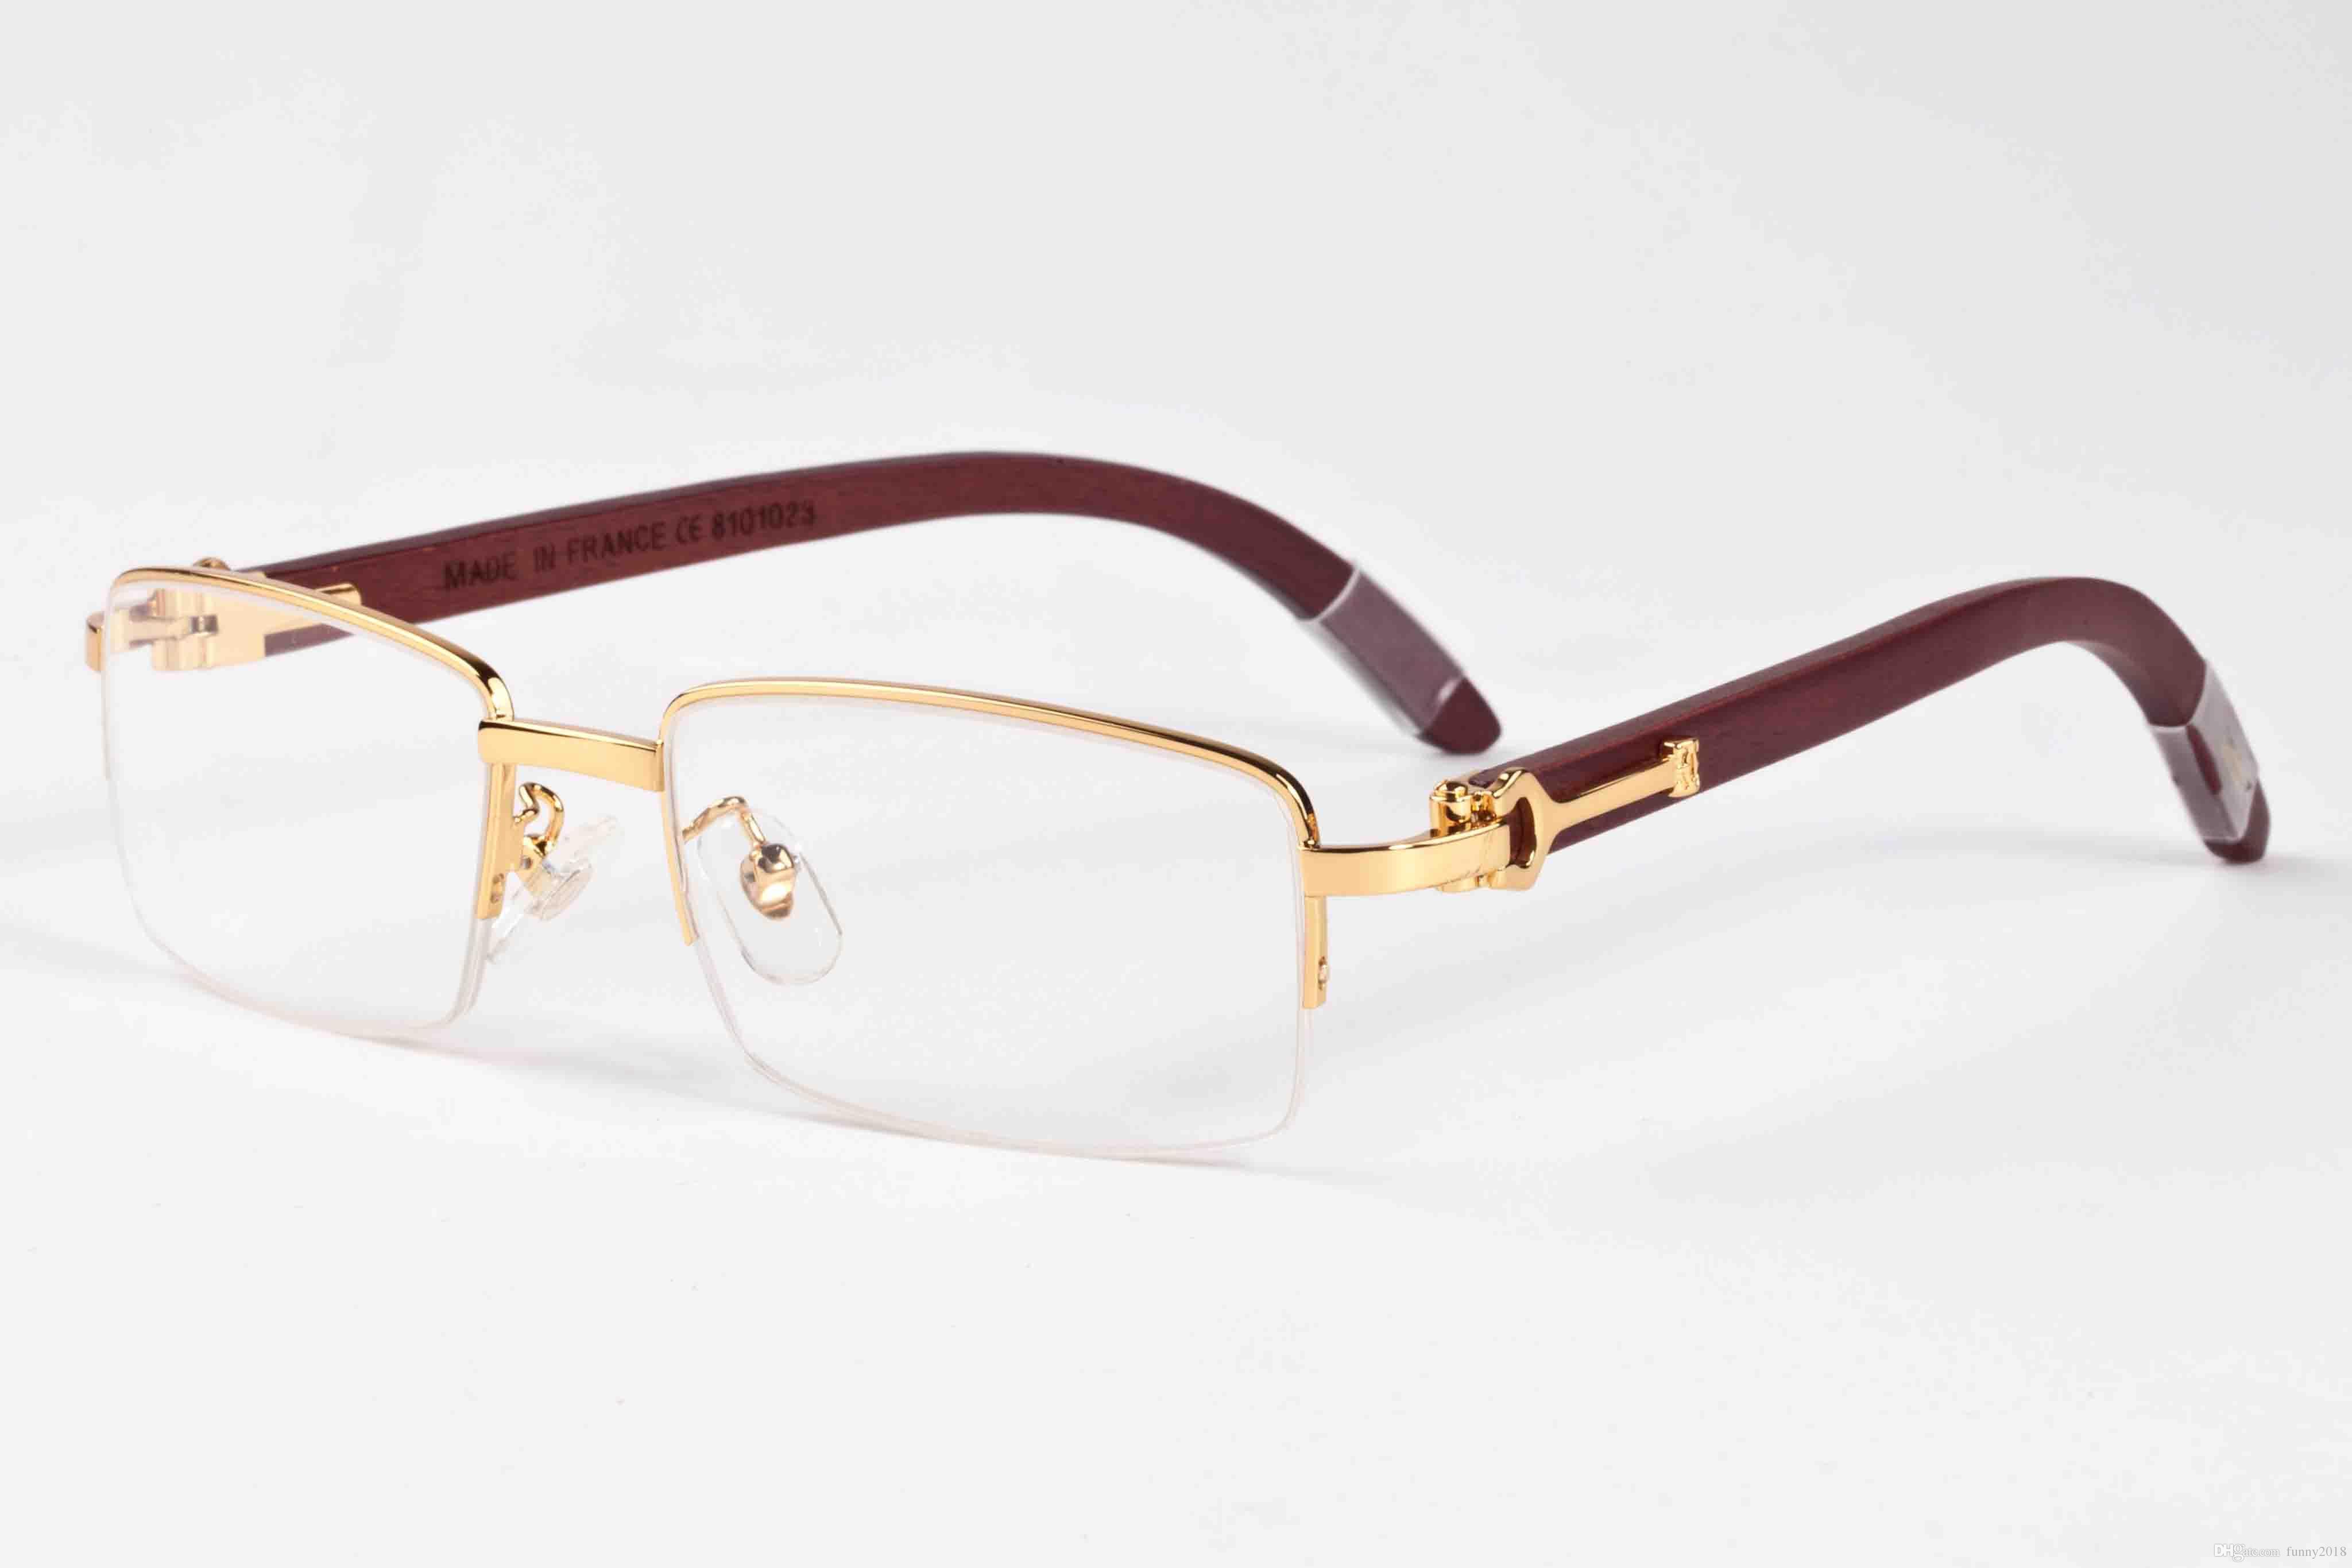 7d4b2838d1 2017 Fashion Classic Retro Style Sunglasses For Men Women Brand Designer  Glass Lens Buffalo Horn Sun Glasses Wood Half Frame With Box Sunglasses At  Night ...